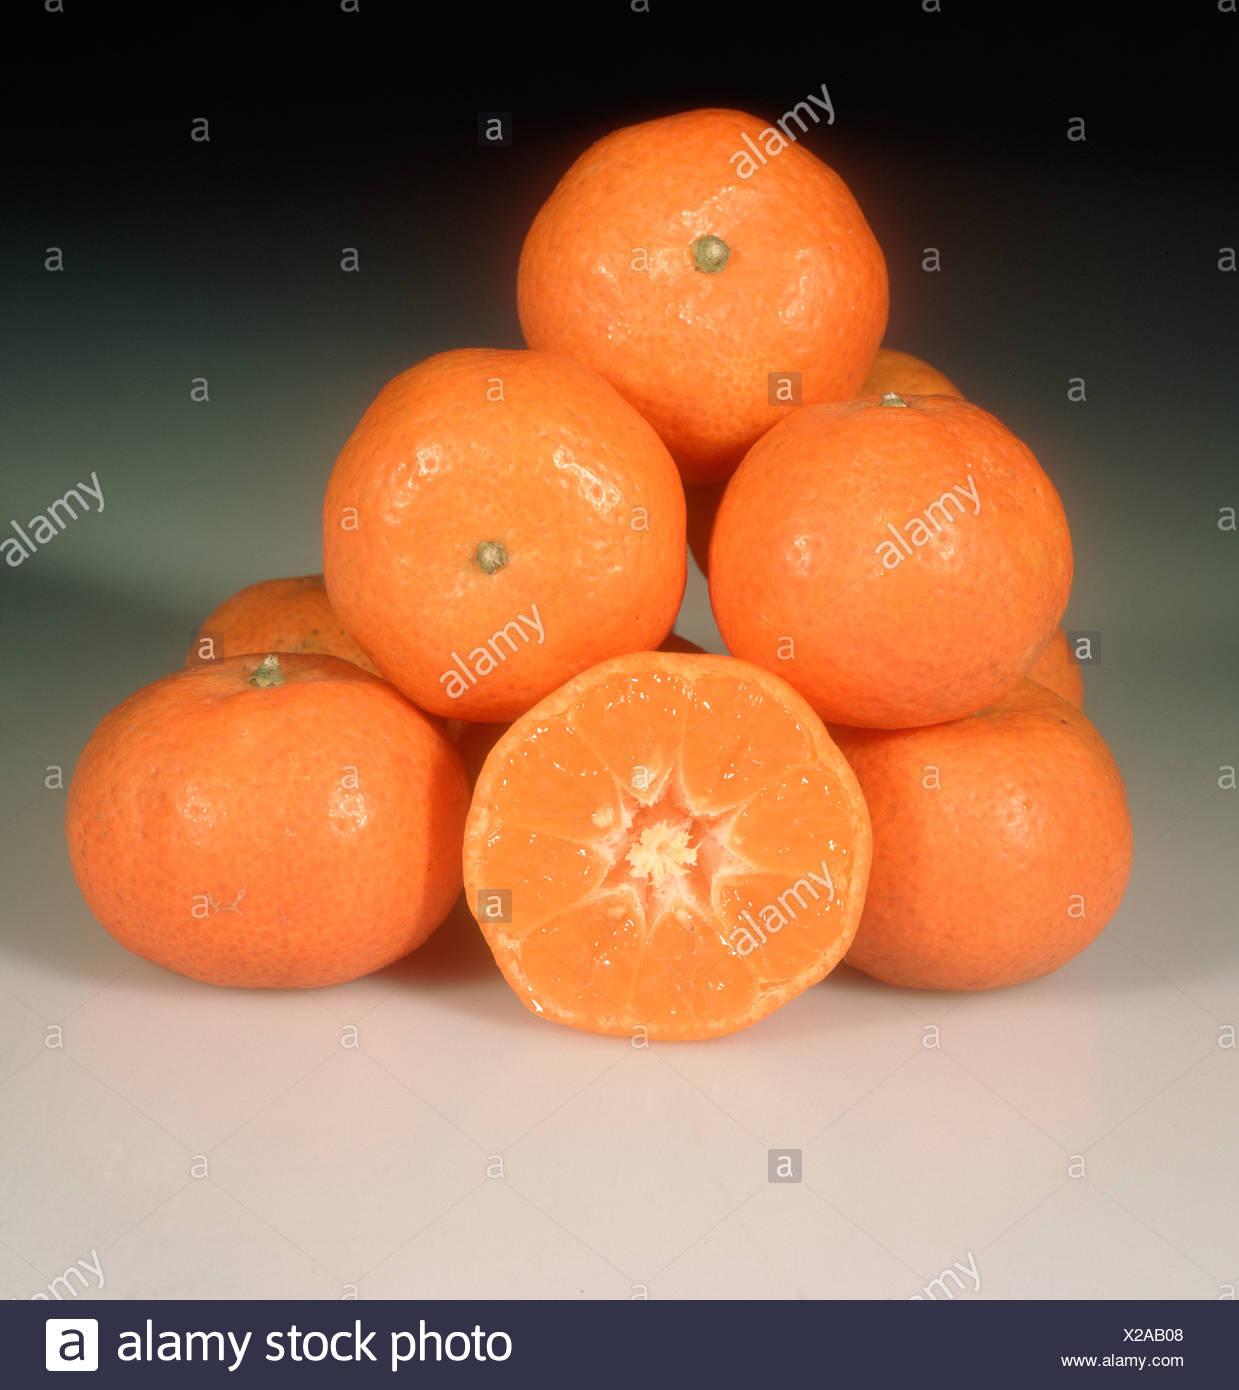 Group of mandarin fruit whole sectioned variety Sunk Mandarin - Stock Image